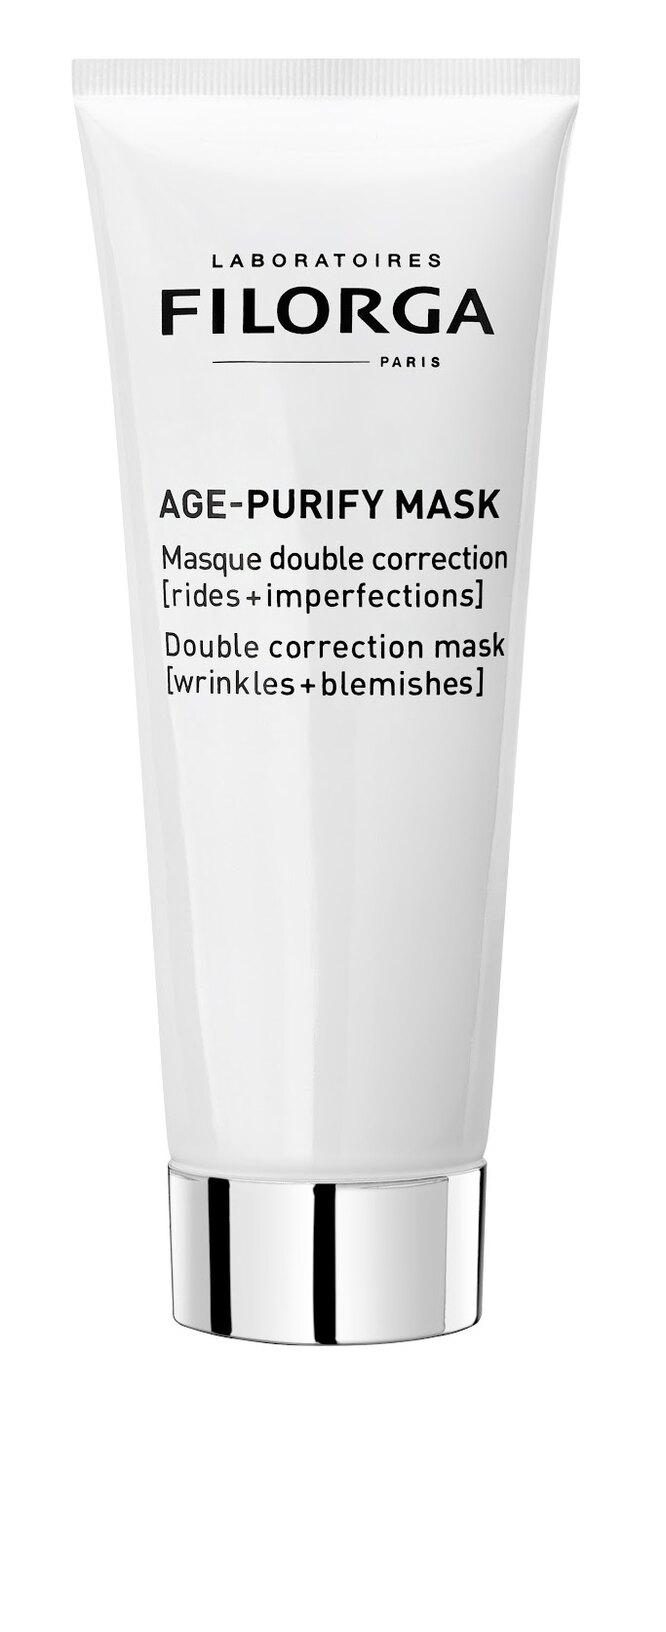 Age-purify mask, Filorga, 4410 руб